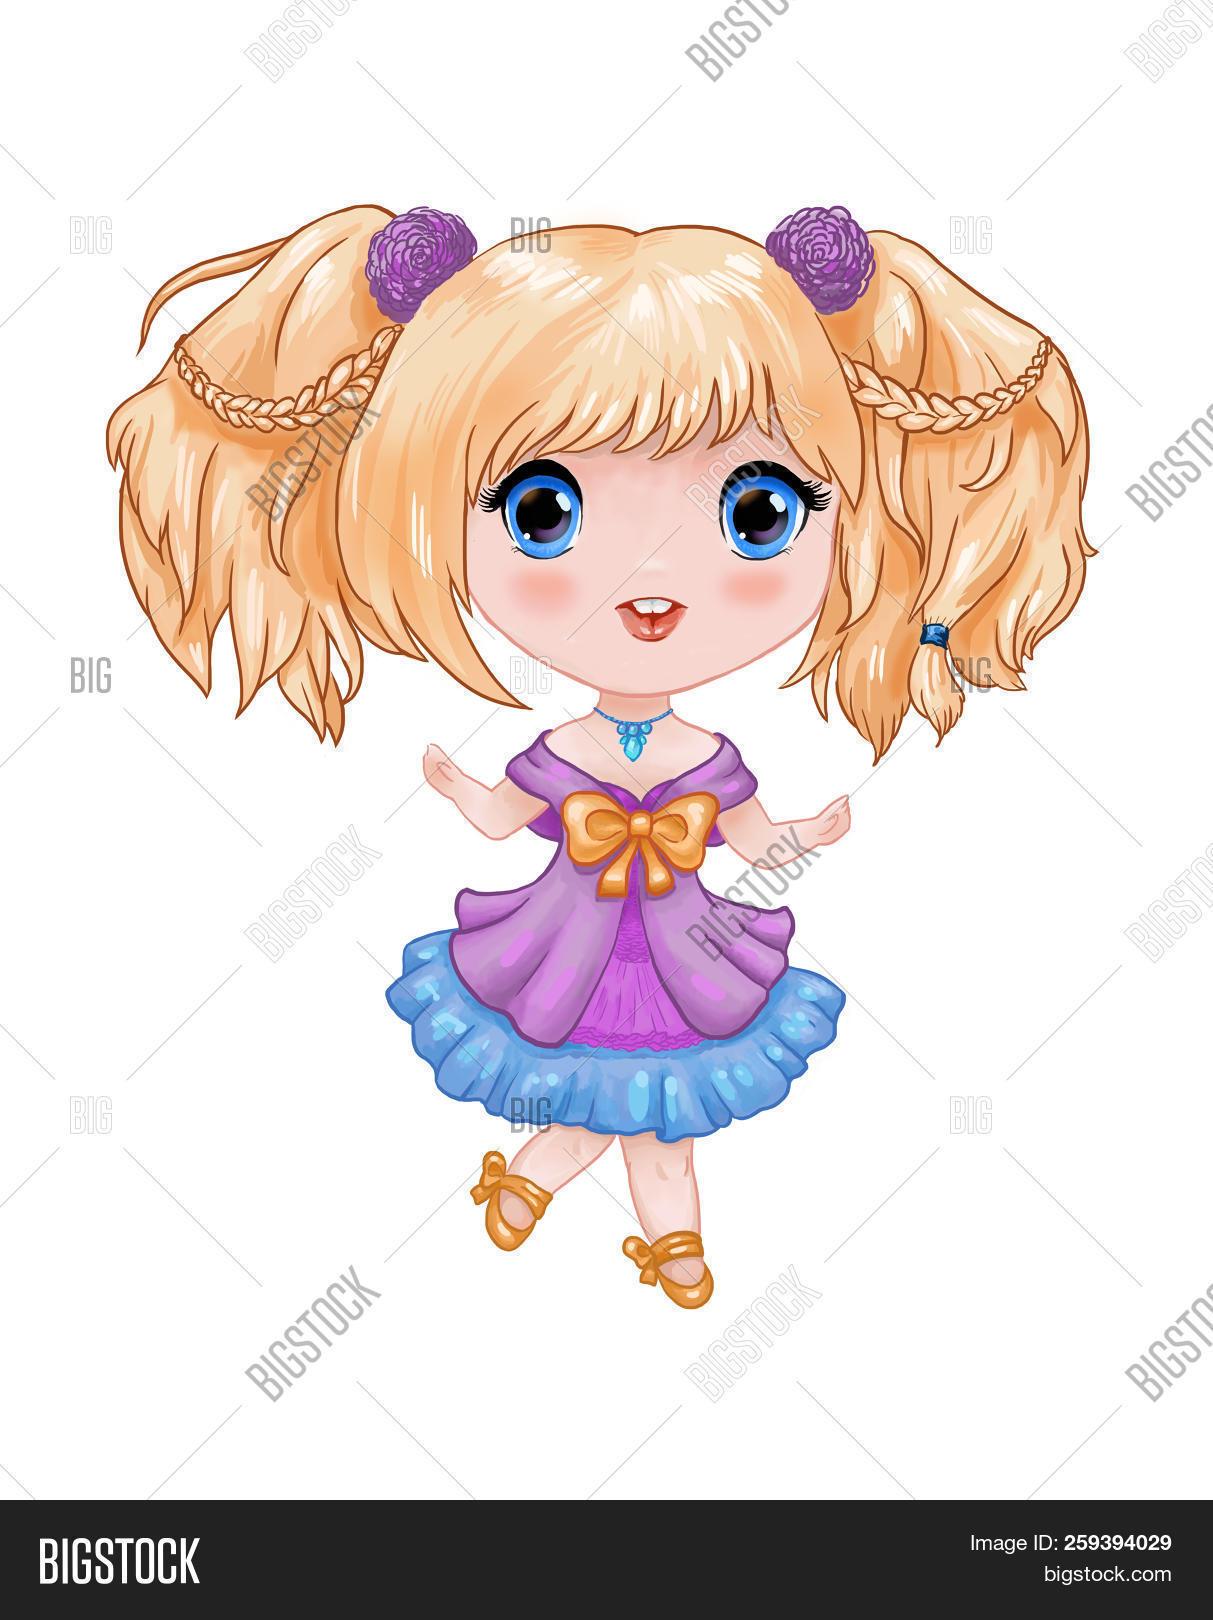 Chibi Illustration Little Cute Anime Girl In Purple Blue Dress